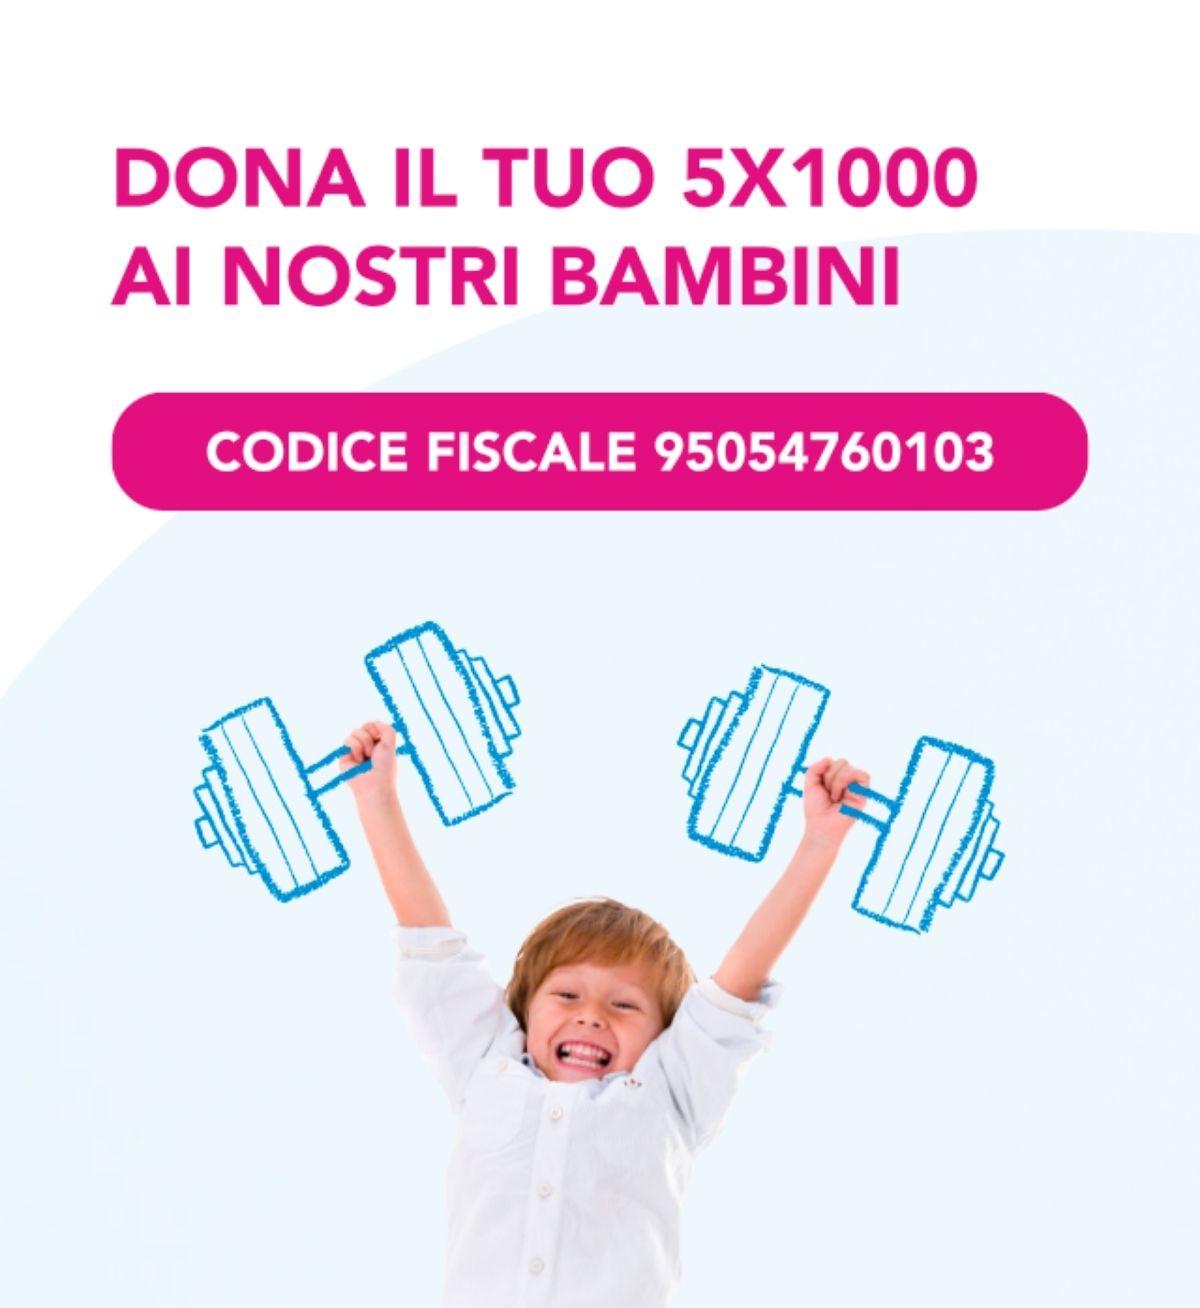 Bambino 5x1000